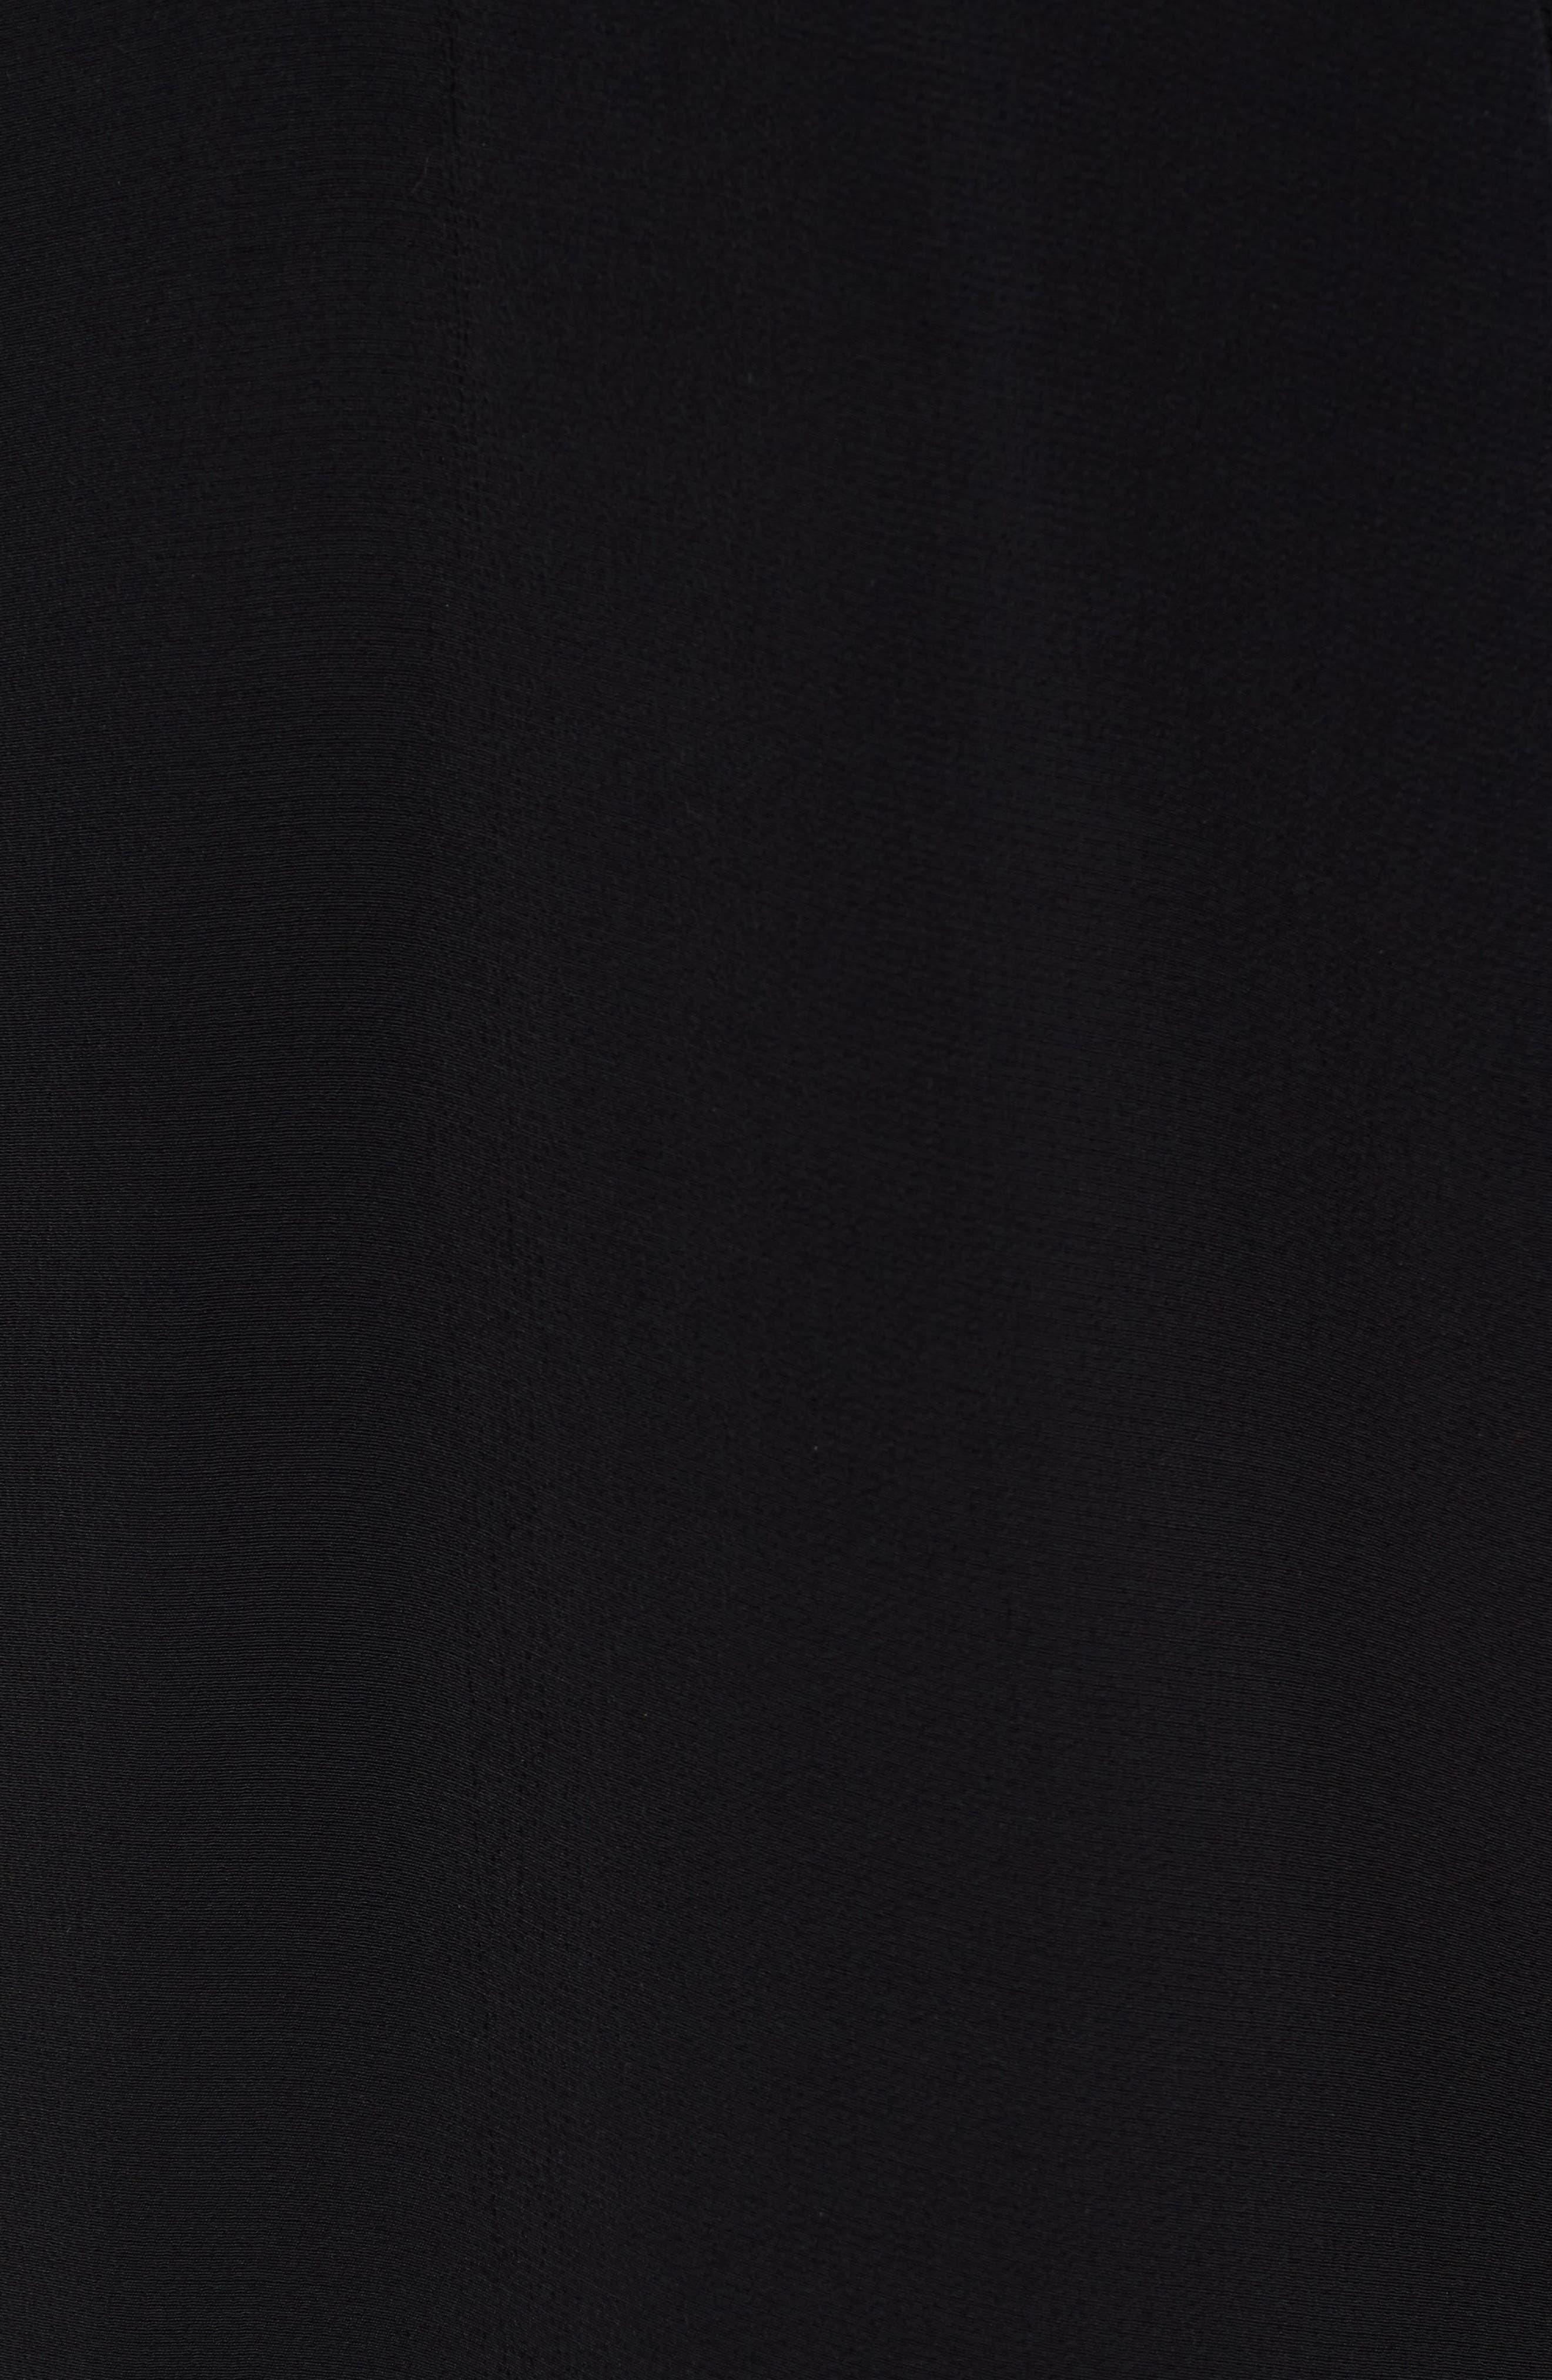 Drop Waist Tencel<sup>®</sup> Lyocell Blend Dress,                             Alternate thumbnail 6, color,                             001